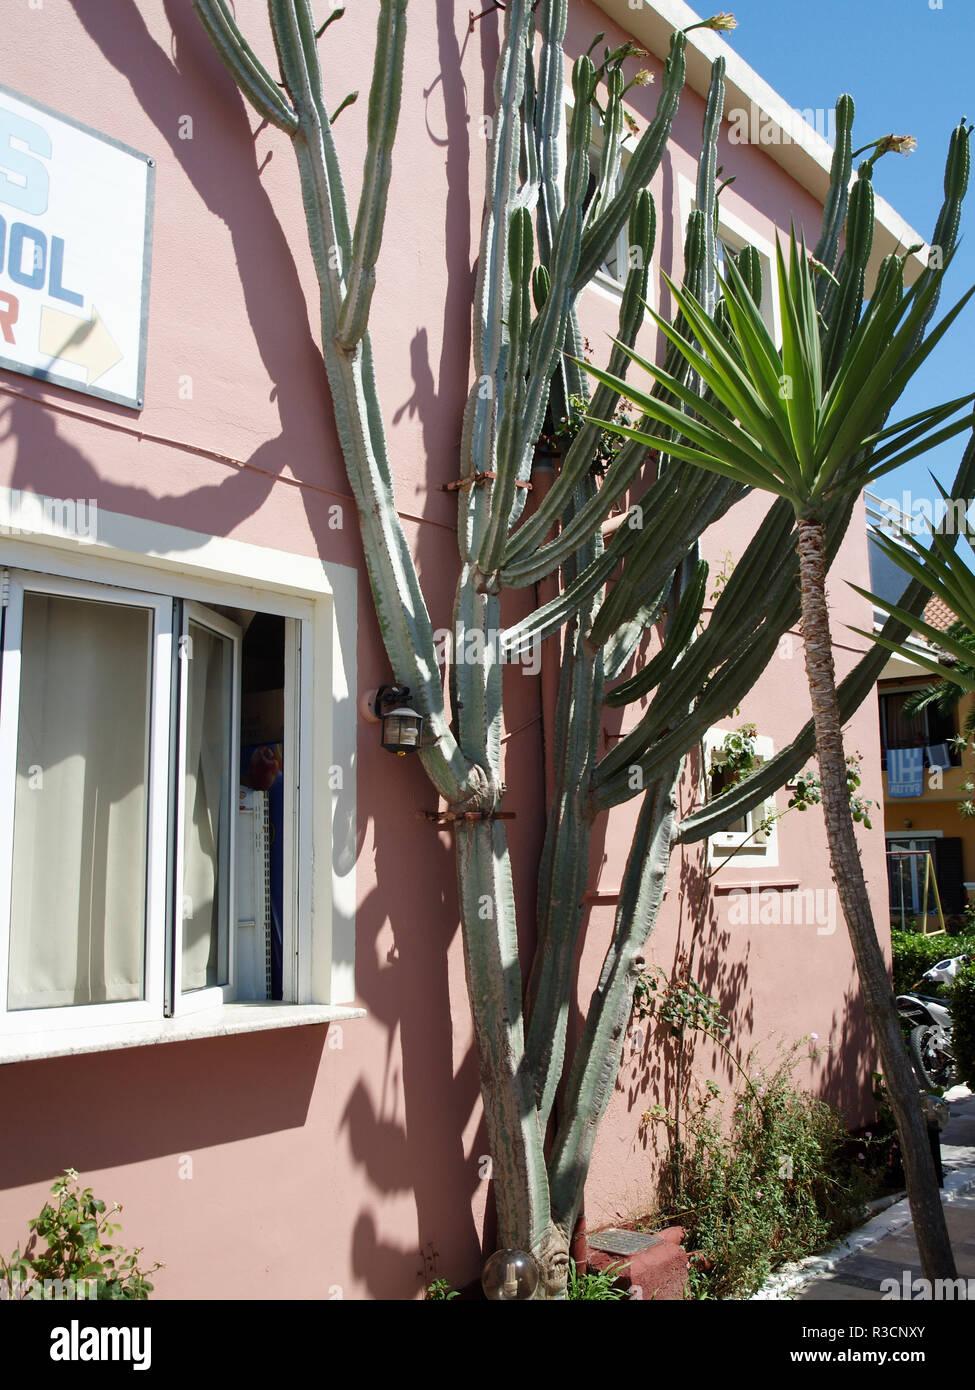 Giant cactus at Makis Apartmentst in Roda, Corfu, greece - Stock Image